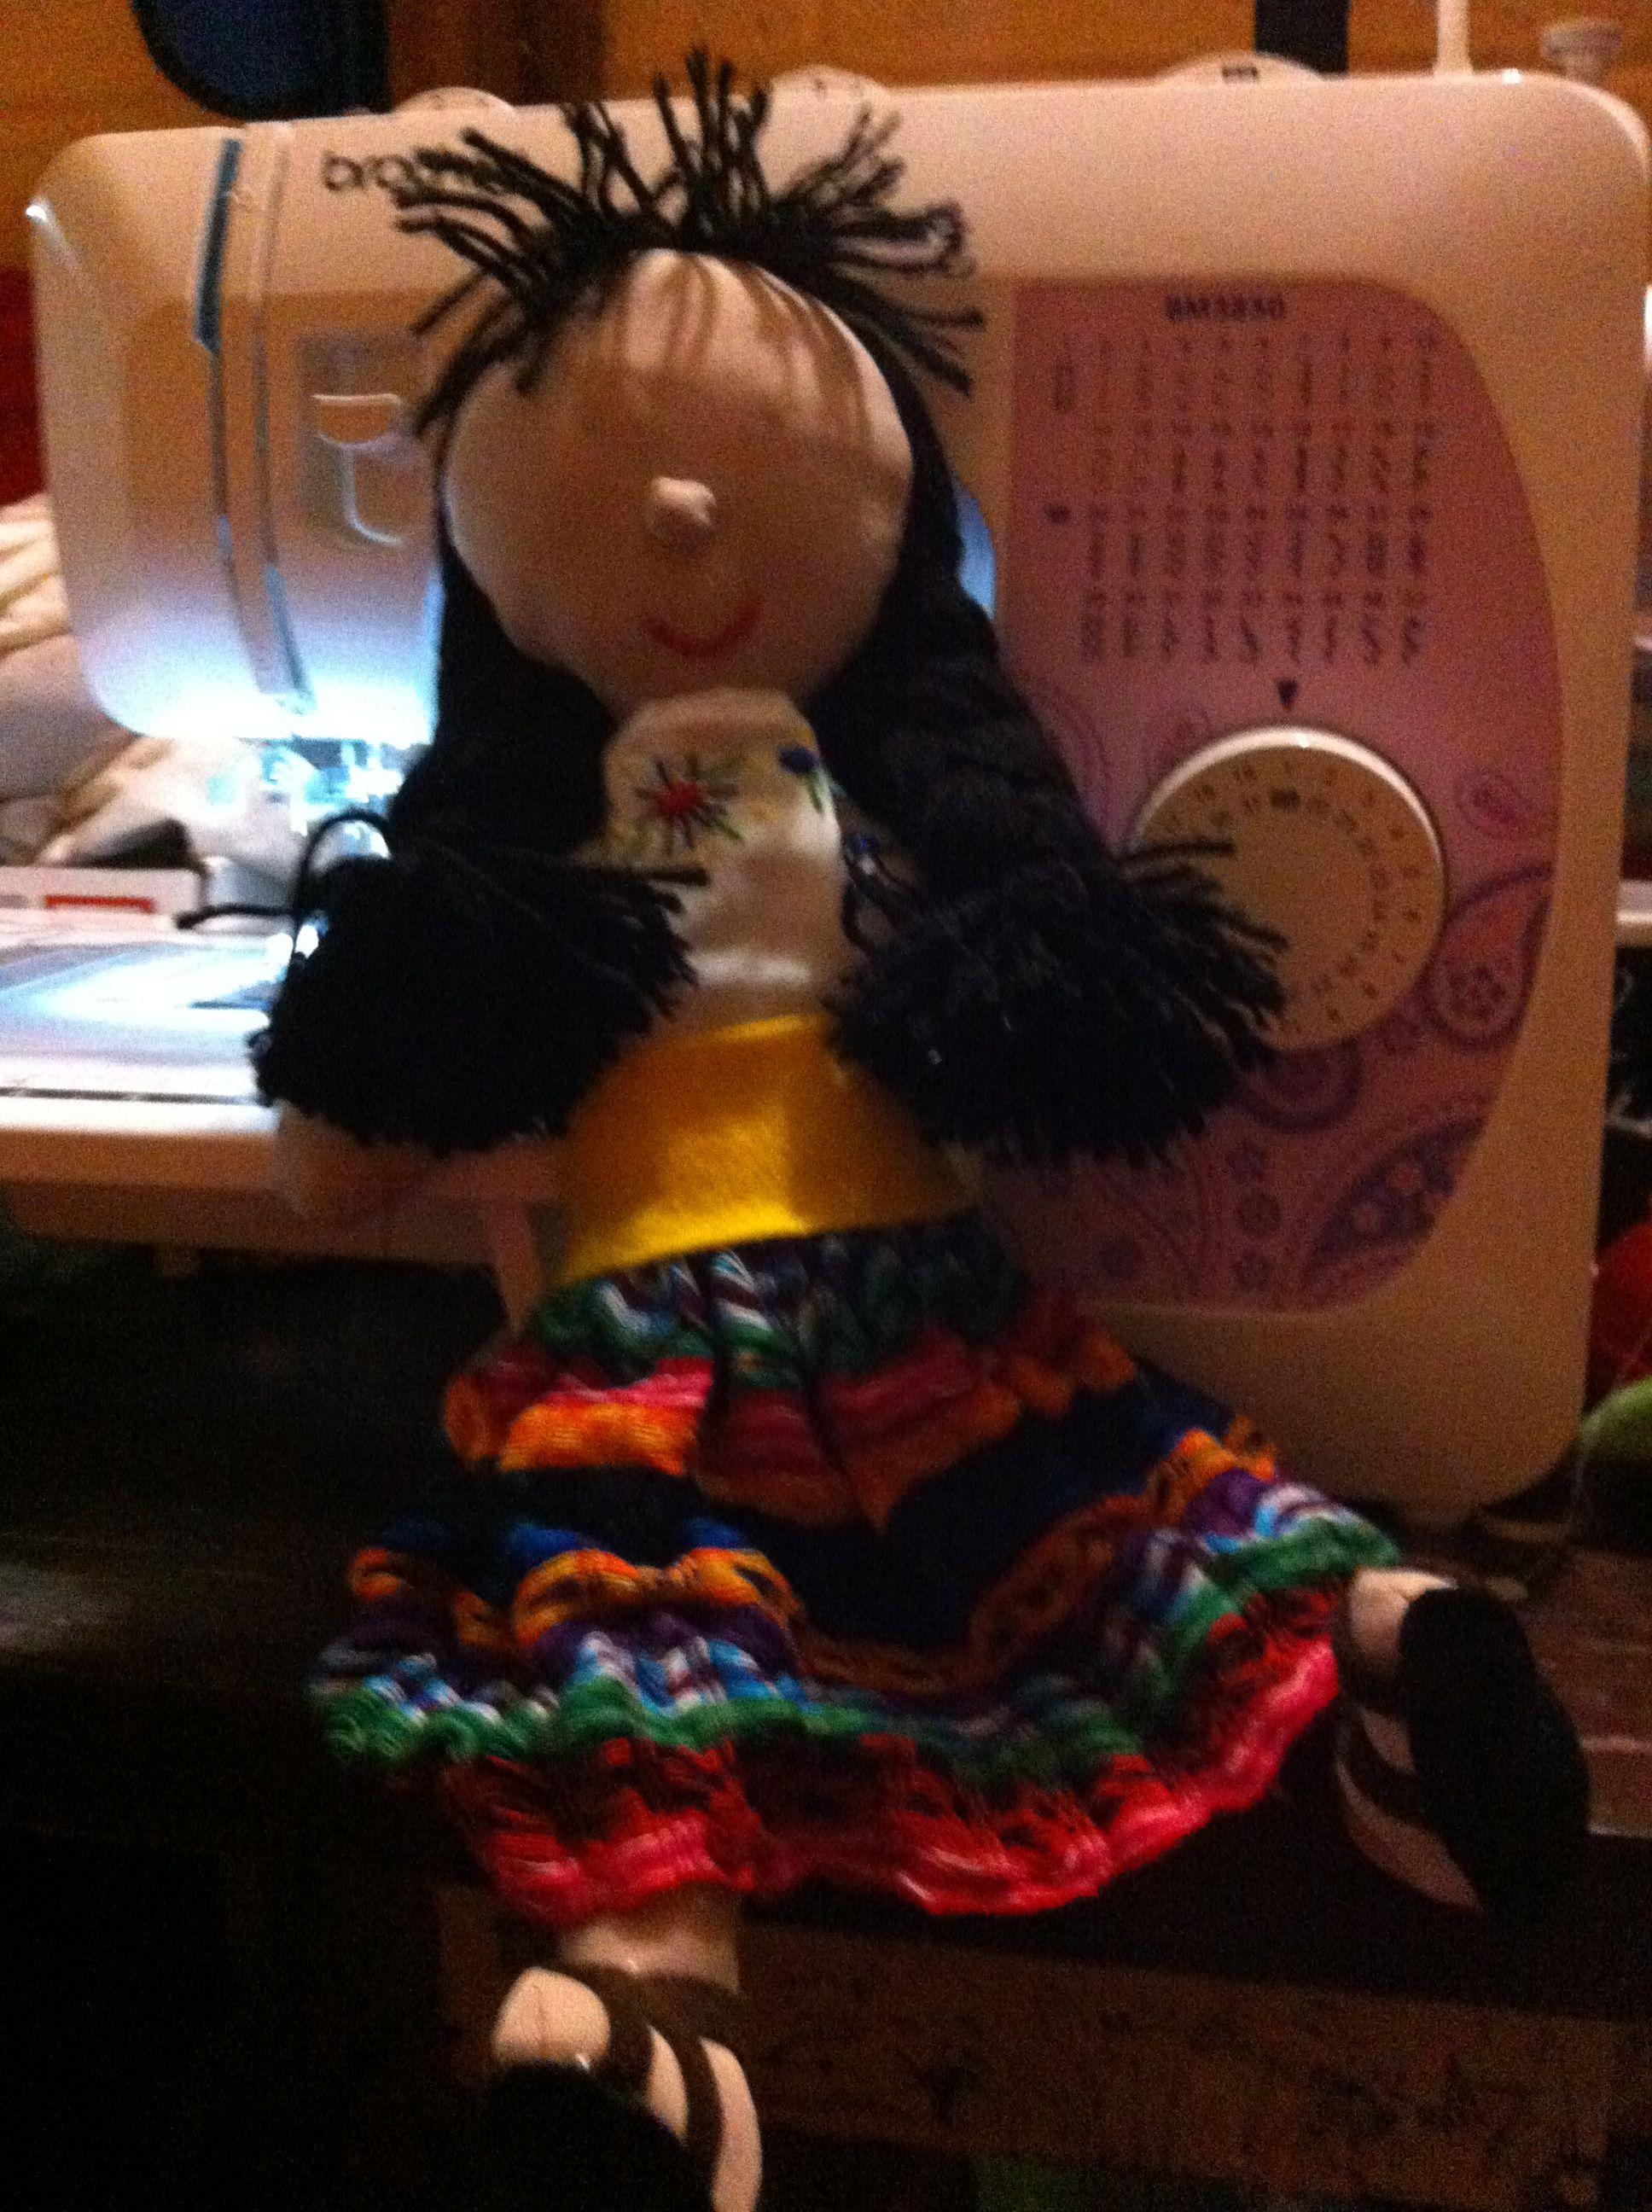 #muñeca de trapo #Guatemala #tradición Muñequita de trapo con traje típico de Guatemala  #tipico